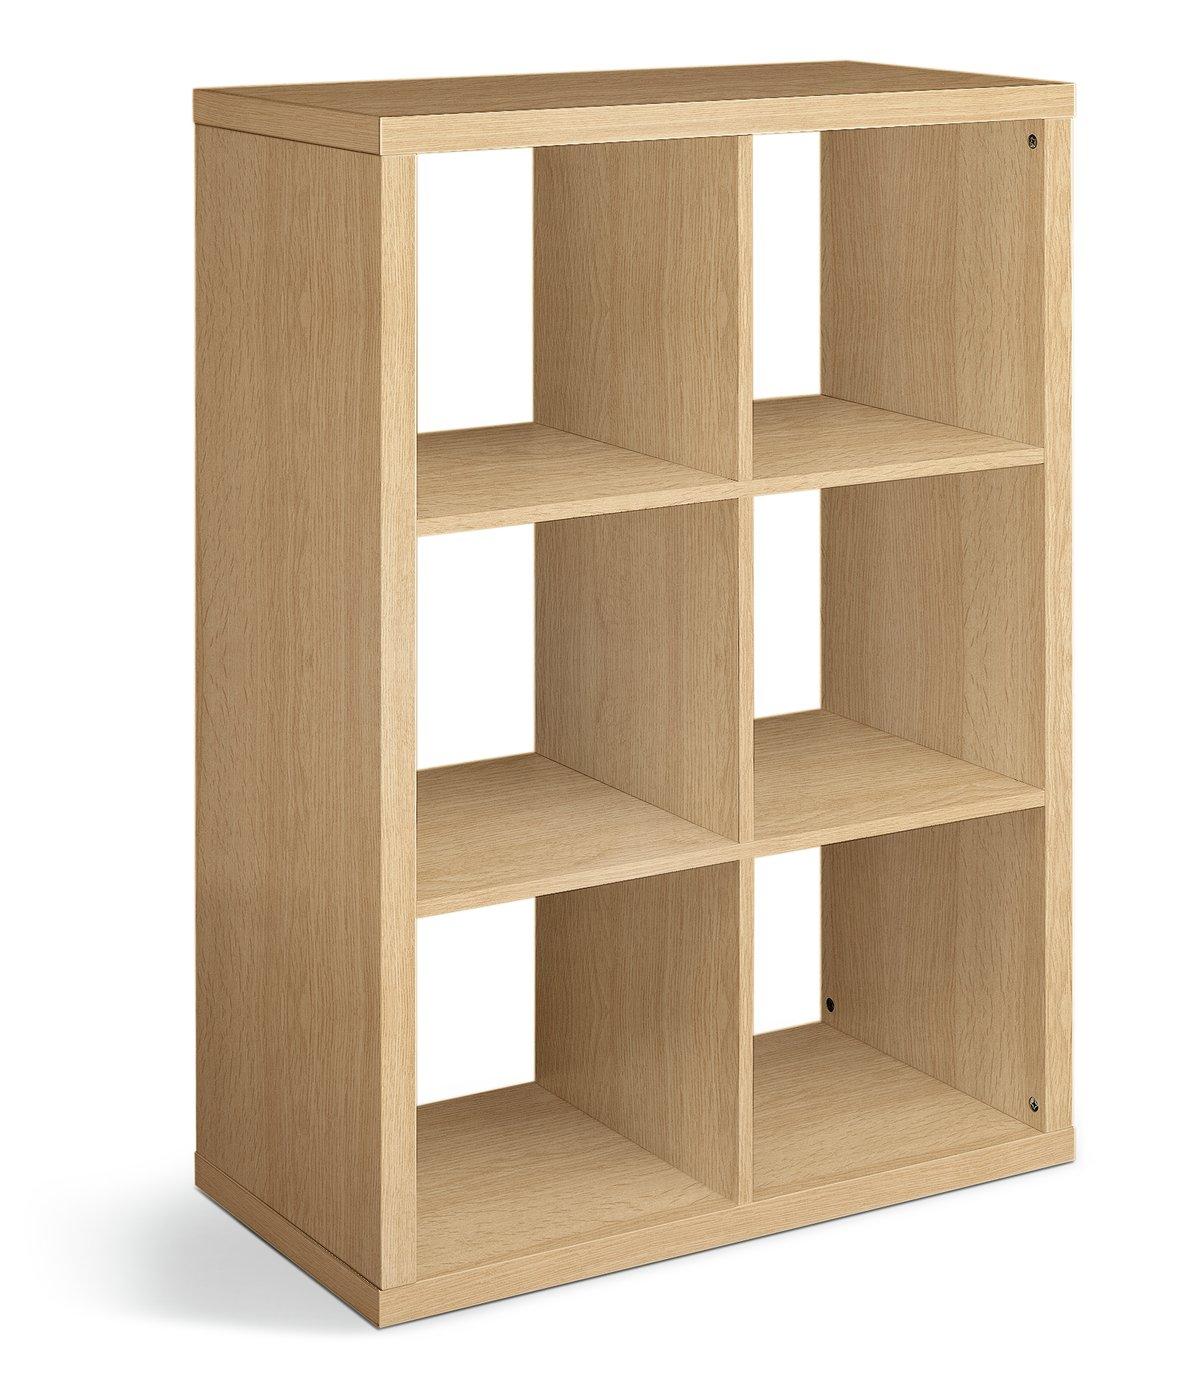 hygena squares plus 16 cube storage unit oak effect. Black Bedroom Furniture Sets. Home Design Ideas